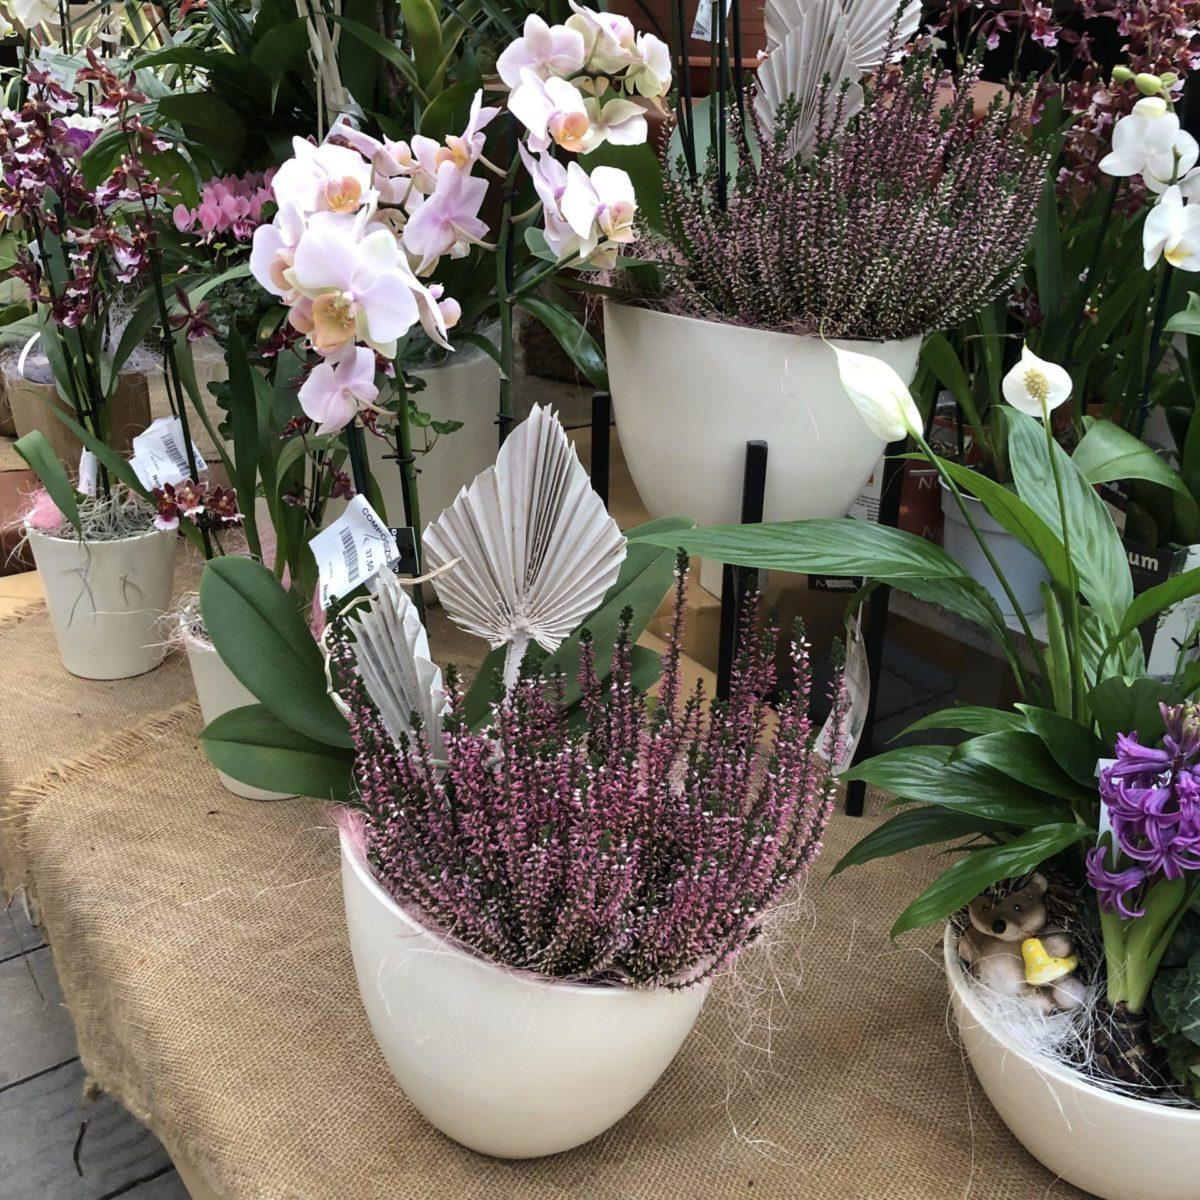 Piante Artificiali Torino : Serra calda garden center quadrifoglio vivaio torino